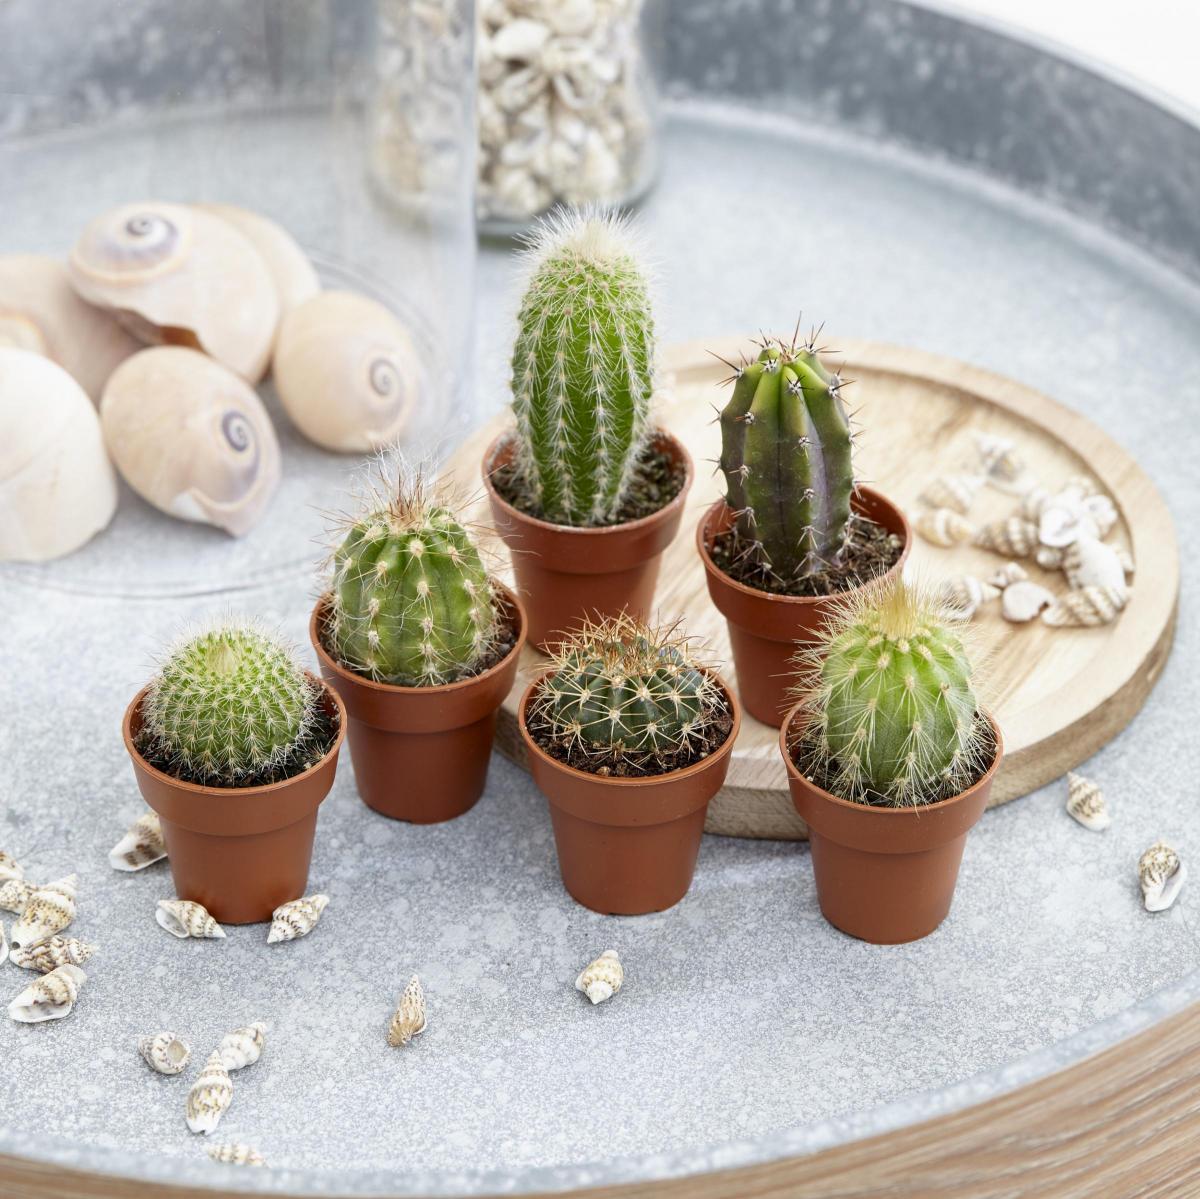 Gardening: Leaf through 11 Christmas gifts for gardeners ...